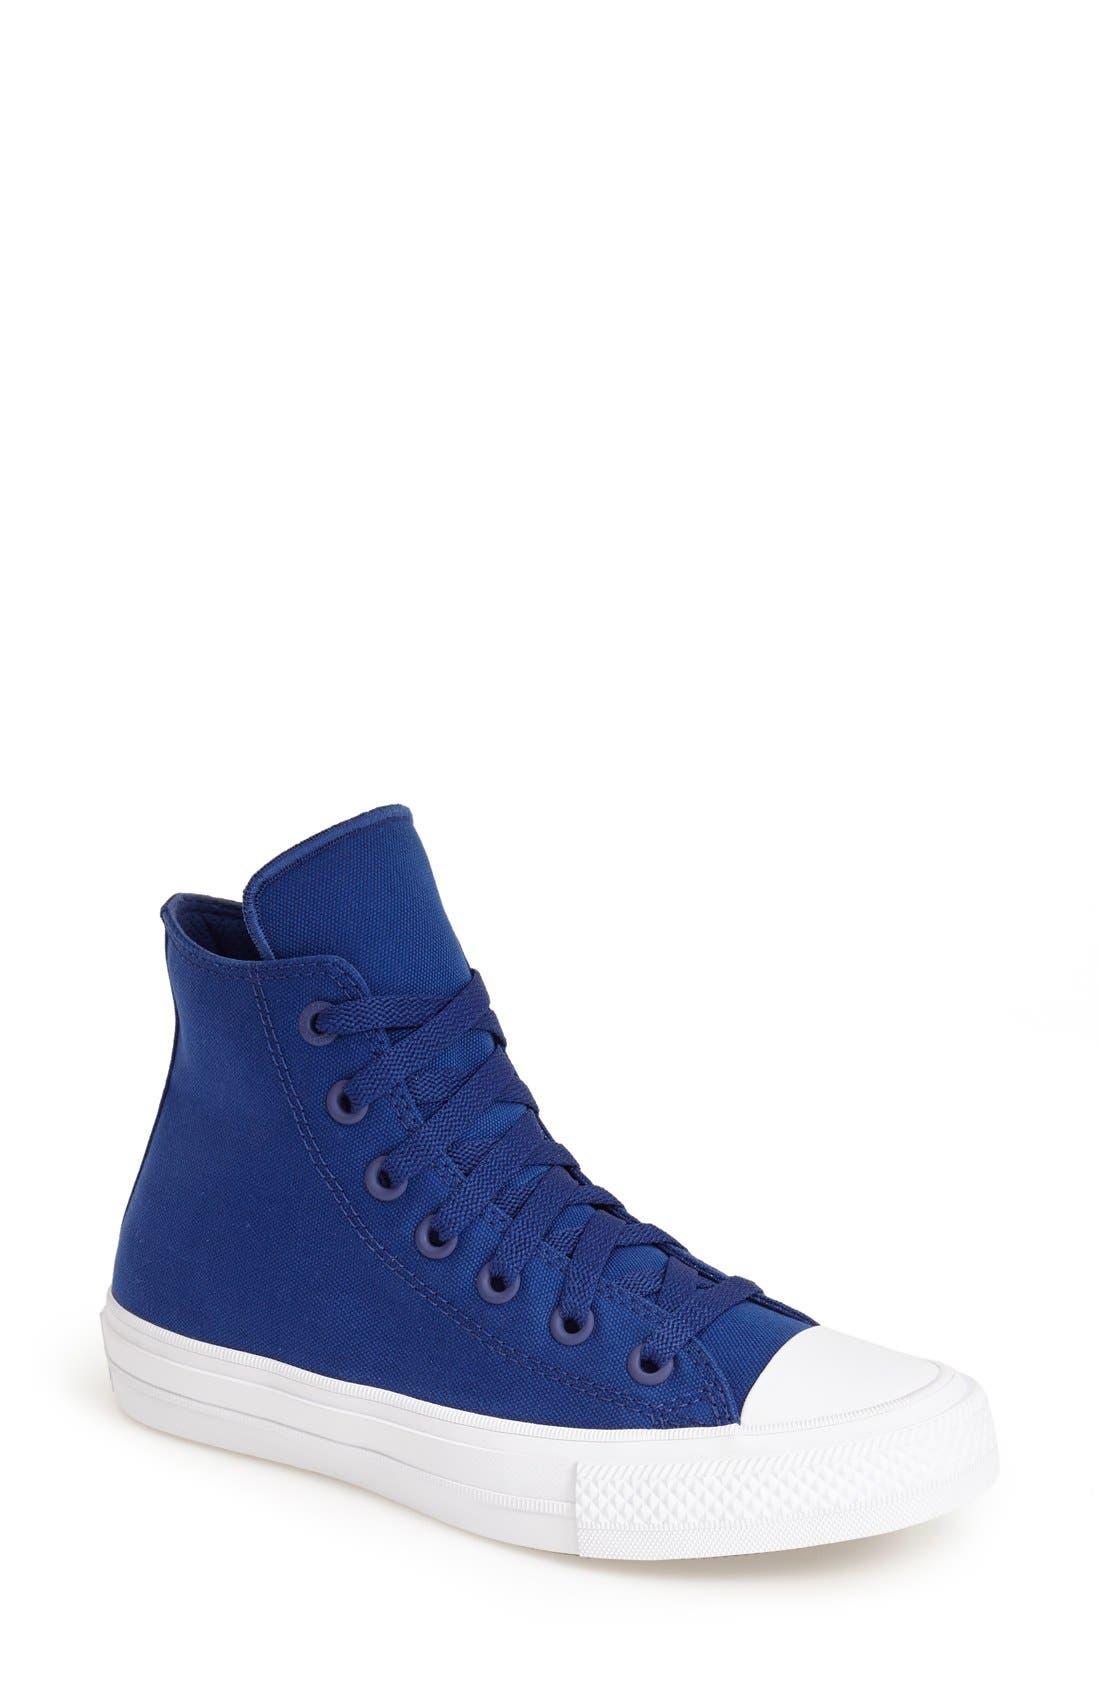 Alternate Image 1 Selected - Converse Chuck Taylor® All Star® 'Chuck II' High Top Sneaker (Women) (Regular Retail Price: $74.95)